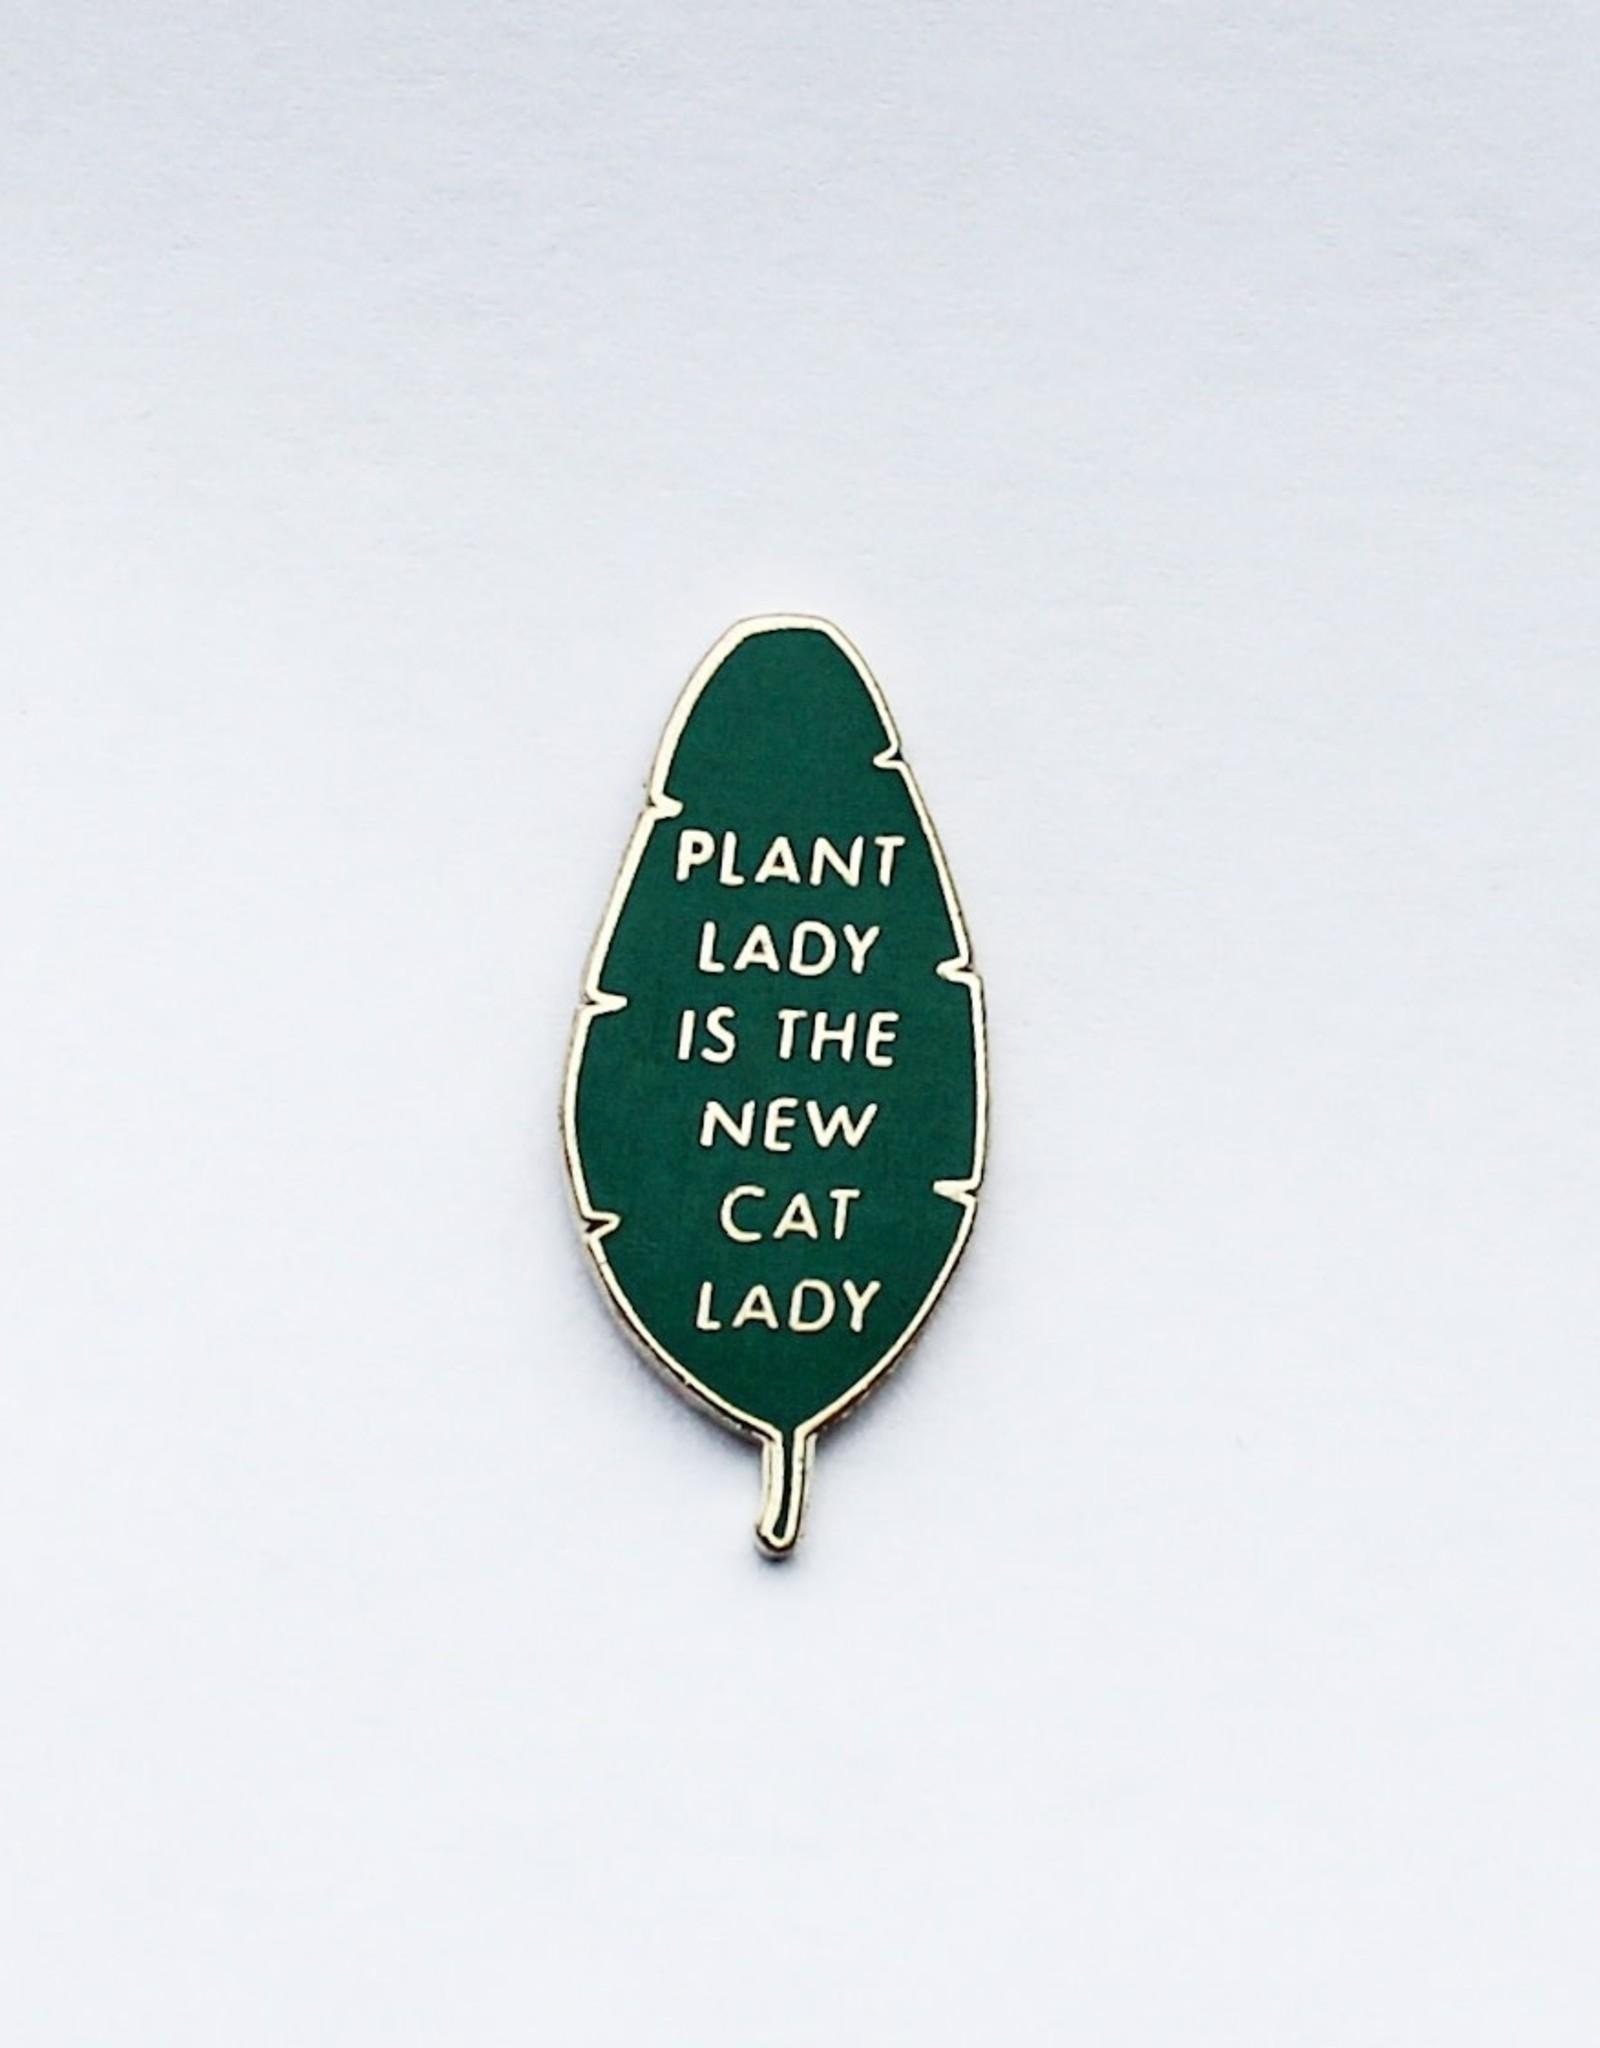 Hemleva Épinglette - Plant Lady is the New Cat Lady